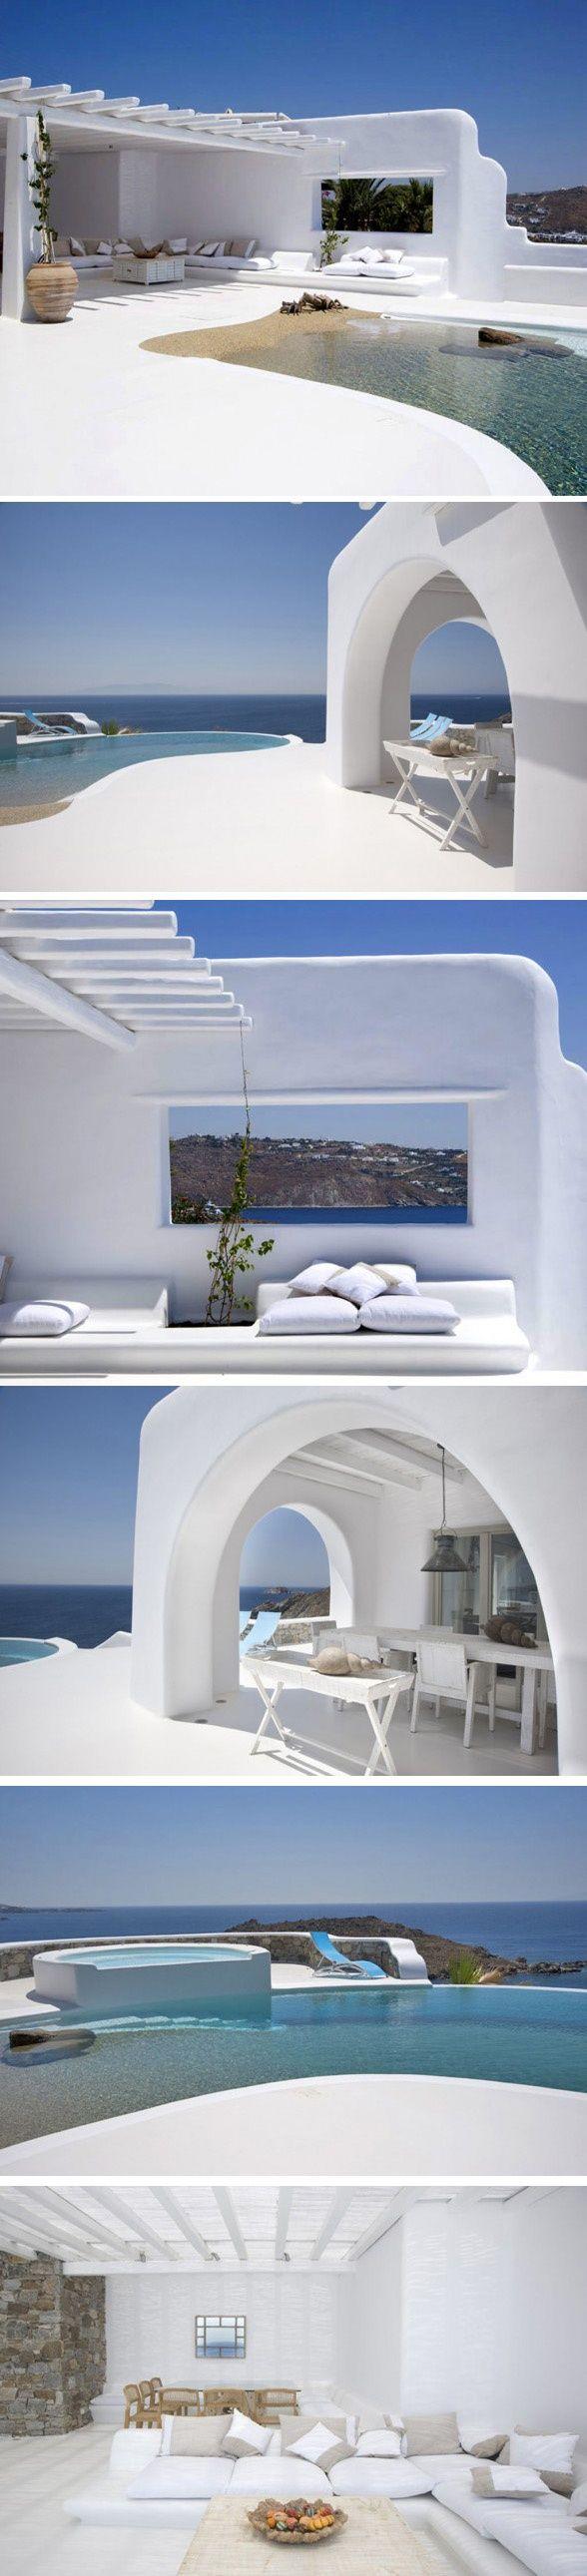 Mykonos Villa 2010, Greece: